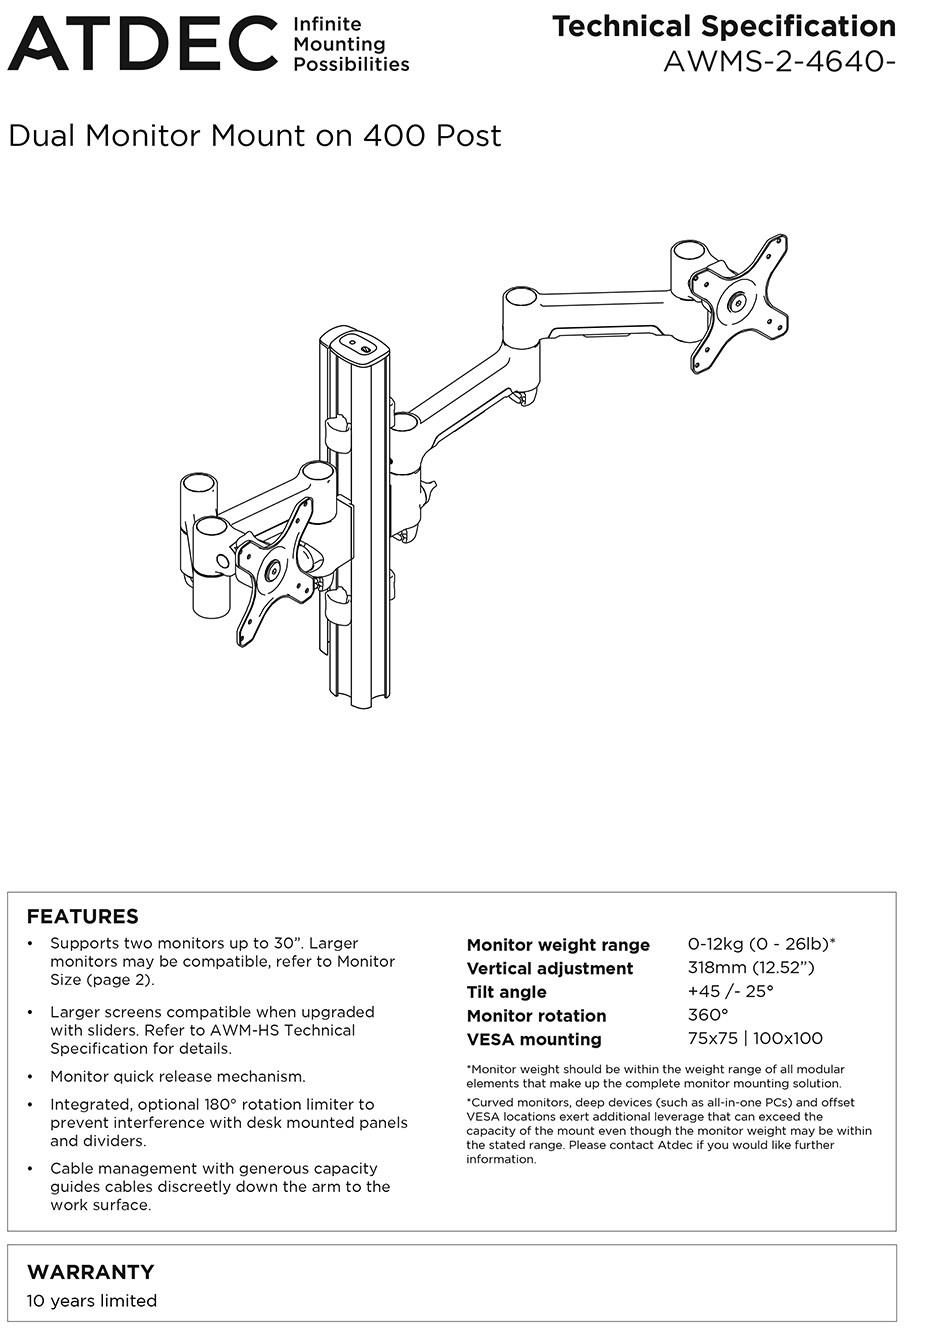 Atdec 400mm Post AWM Dual Monitor Arm Mount Solution - Matte Black - Desktop Overview 1